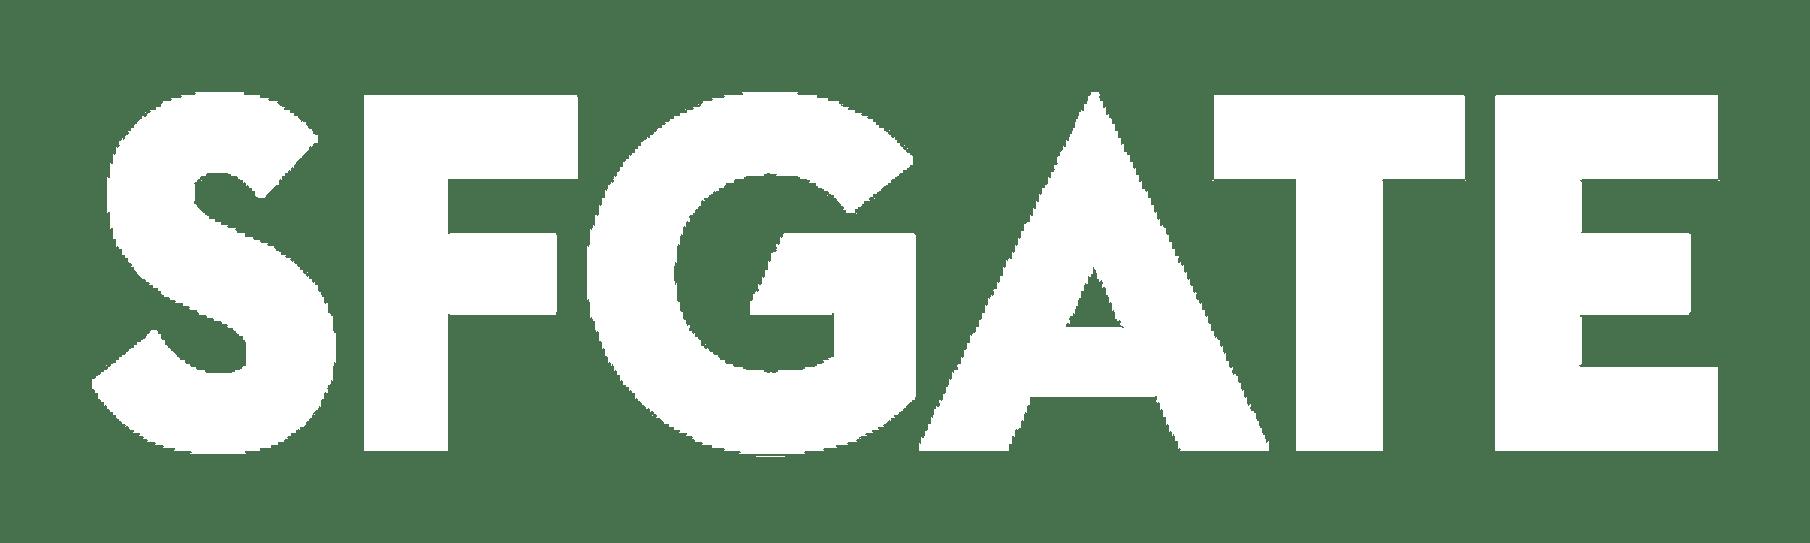 SFGate logo